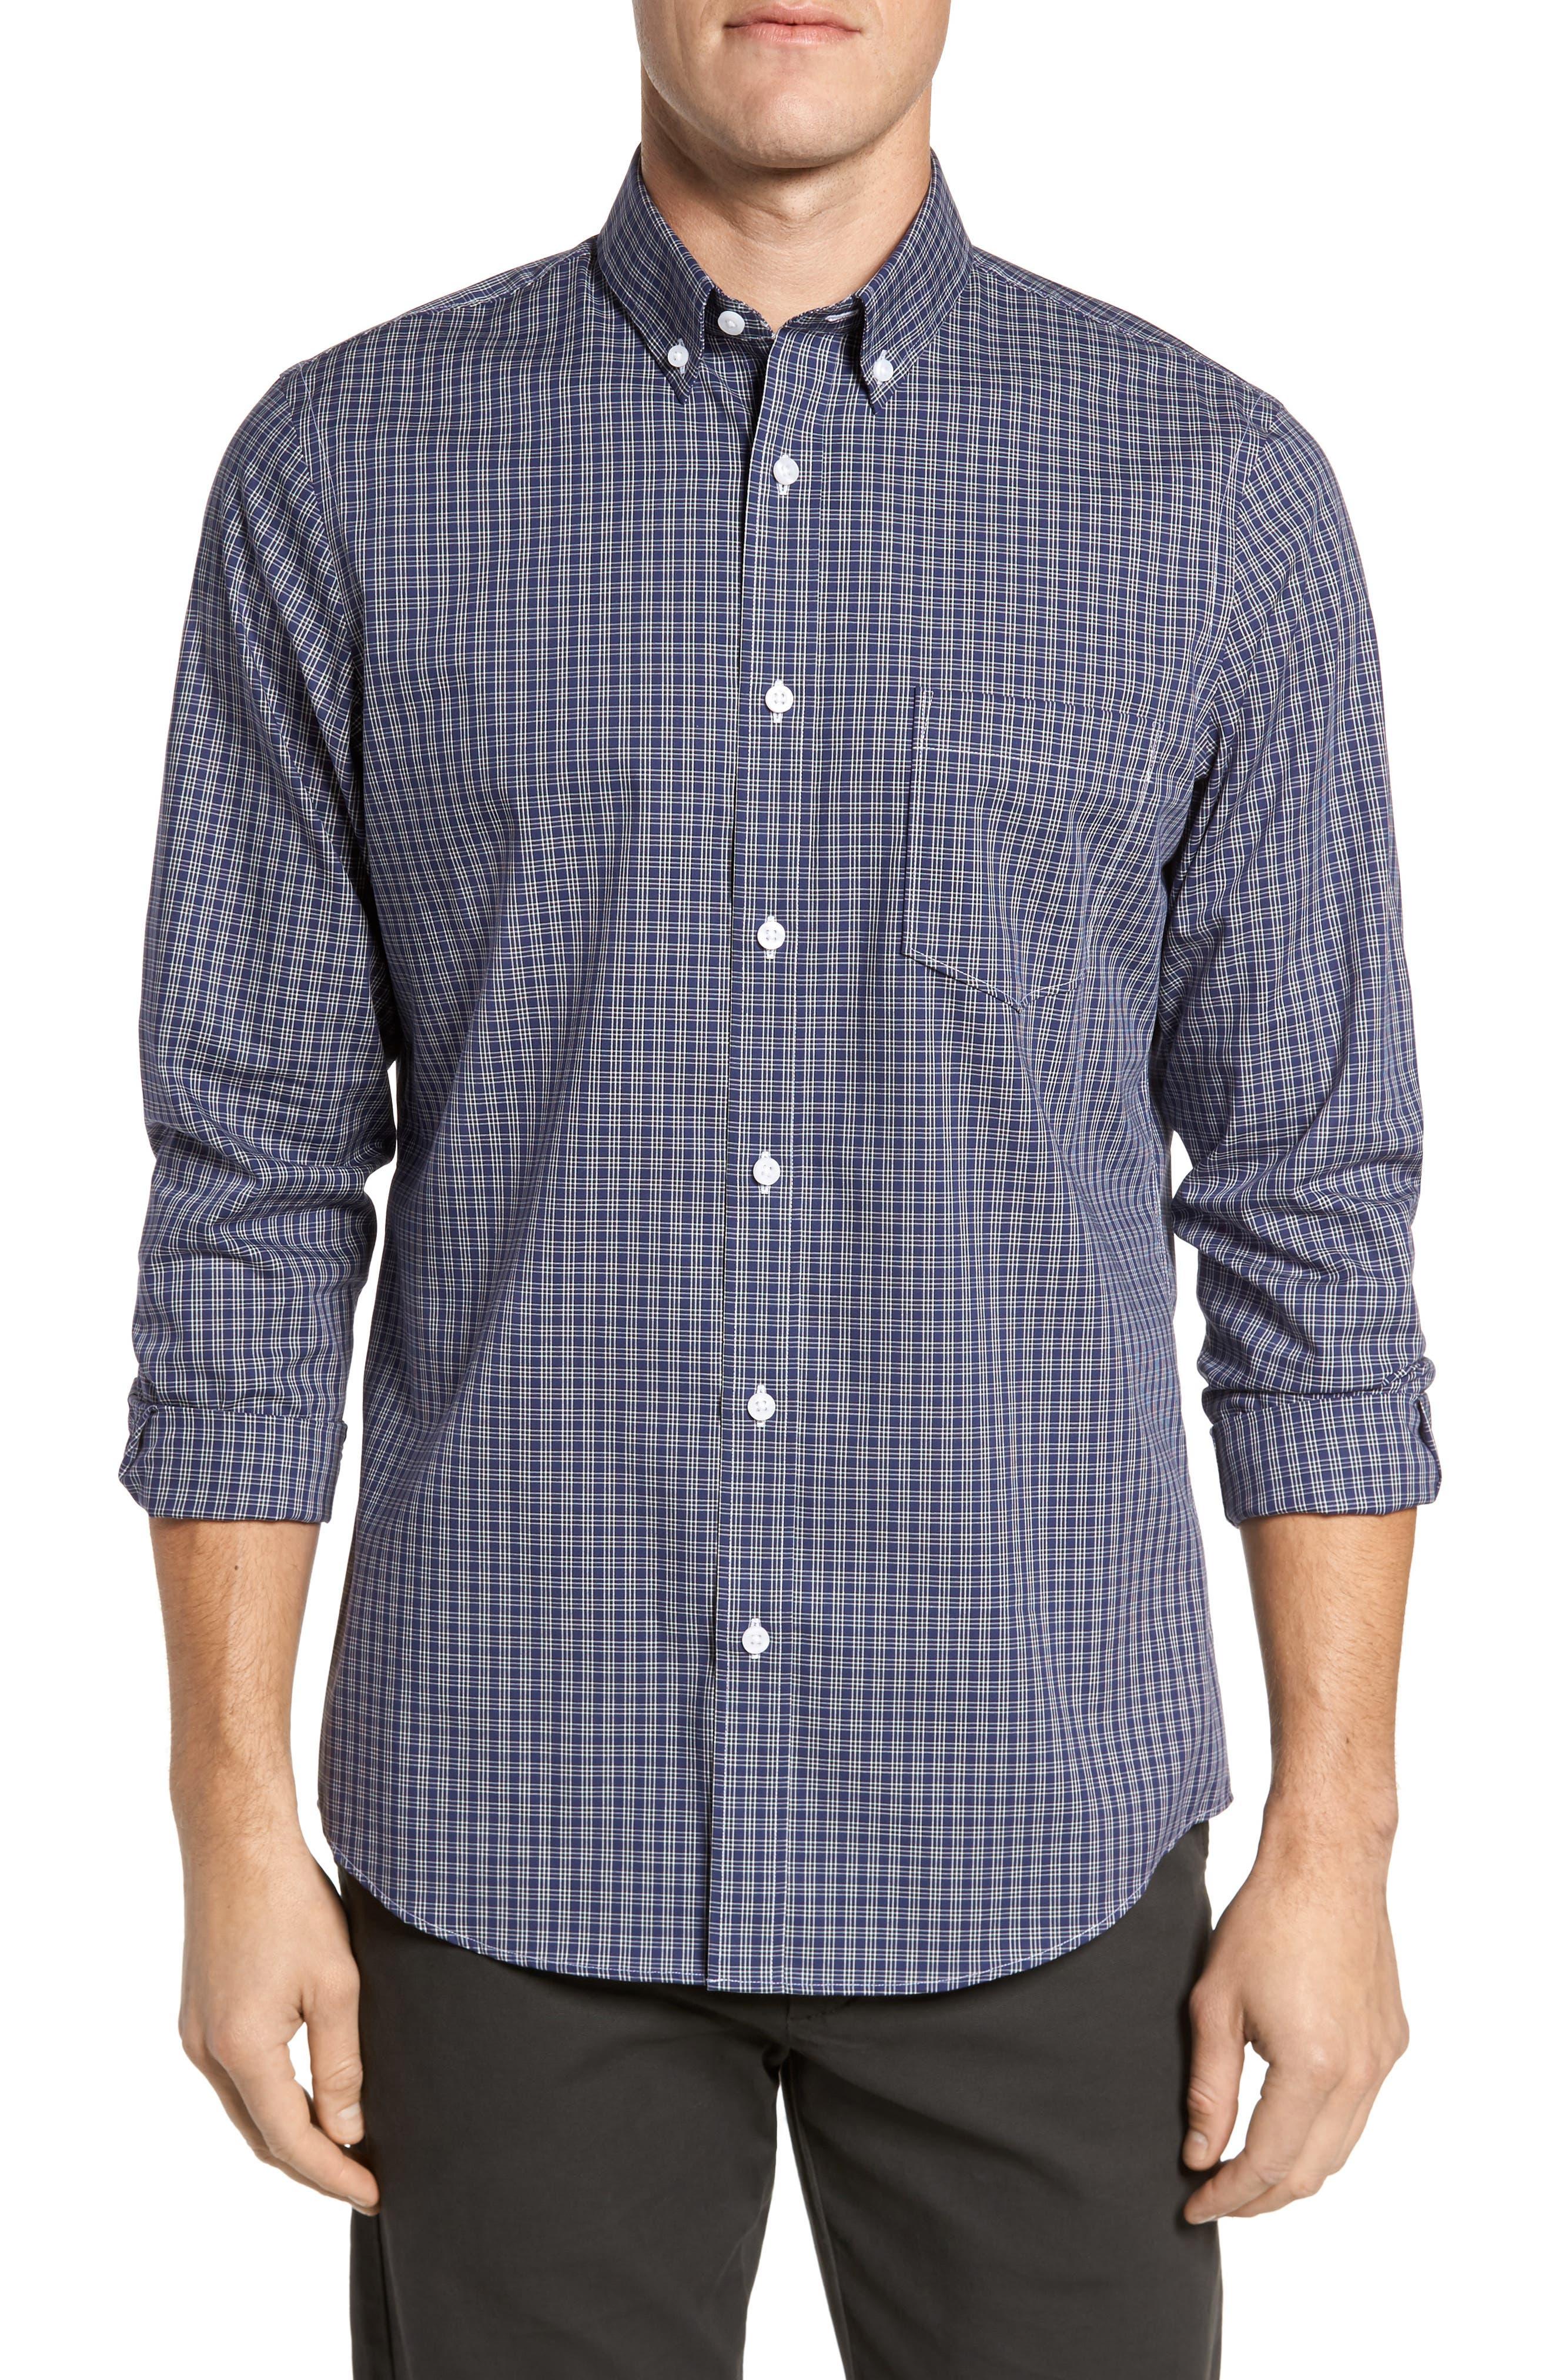 Alternate Image 1 Selected - Nordstrom Men's Shop Regular Fit Non-Iron Mini Check Sport Shirt